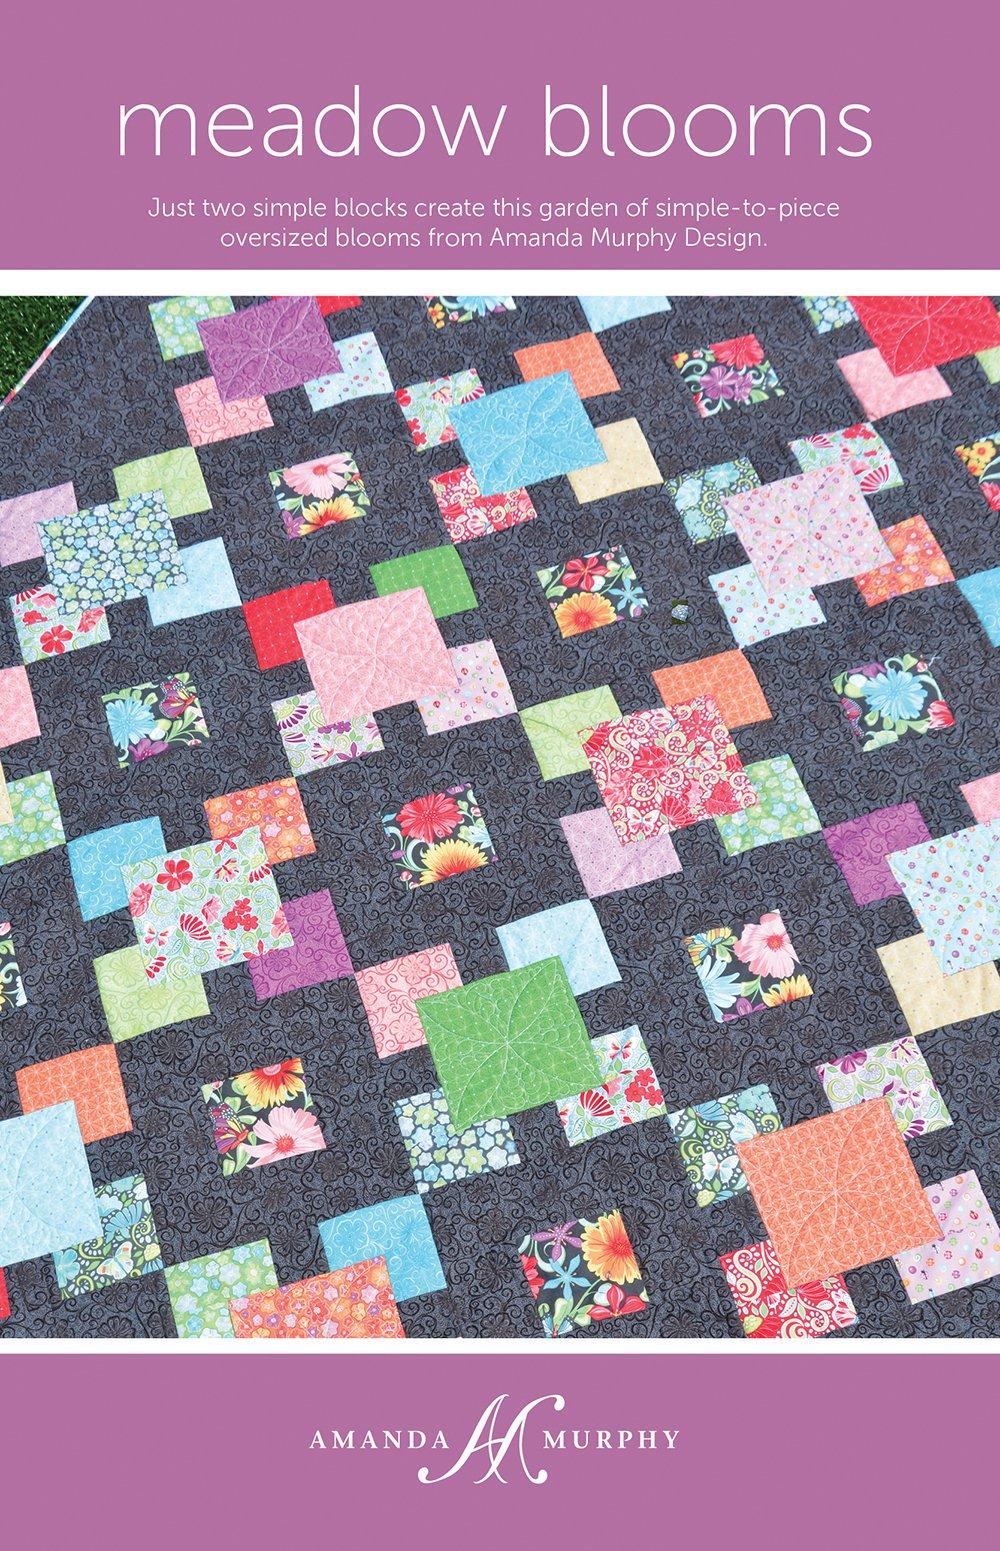 Amanda Murphy Designs - Meadow Blooms